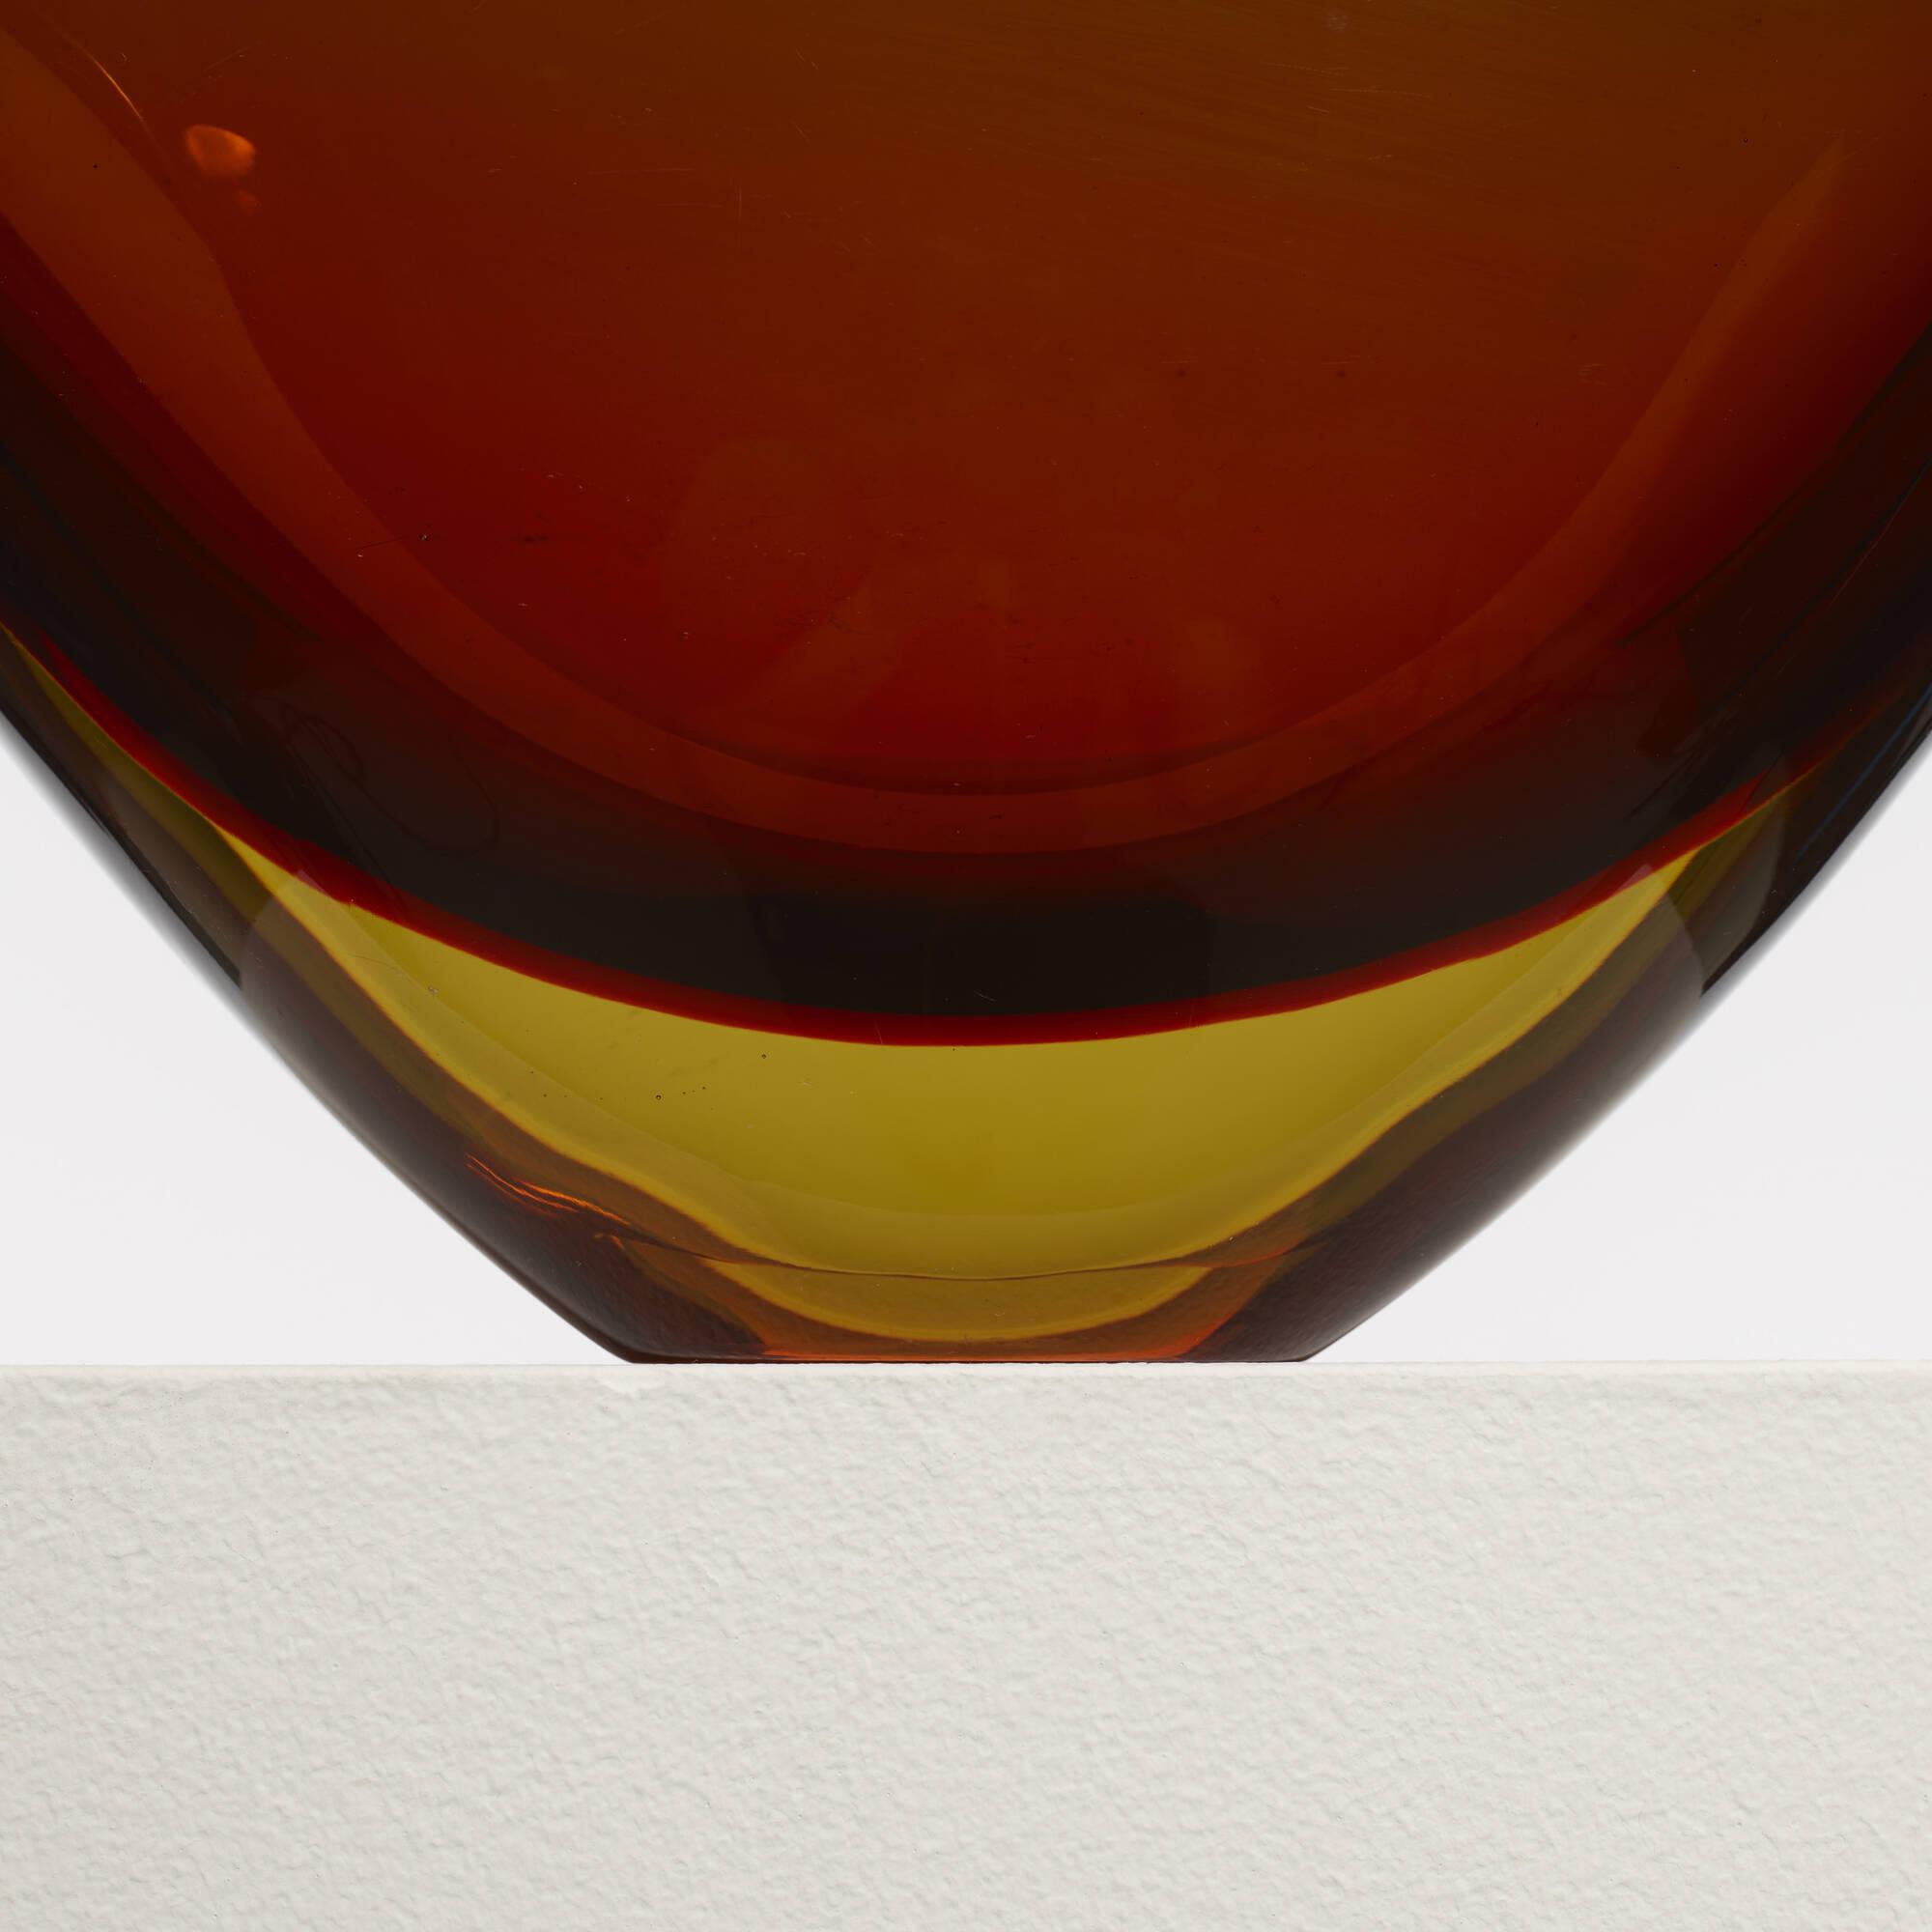 221: Flavio Poli / Sommerso vase, model 12890 (3 of 4)